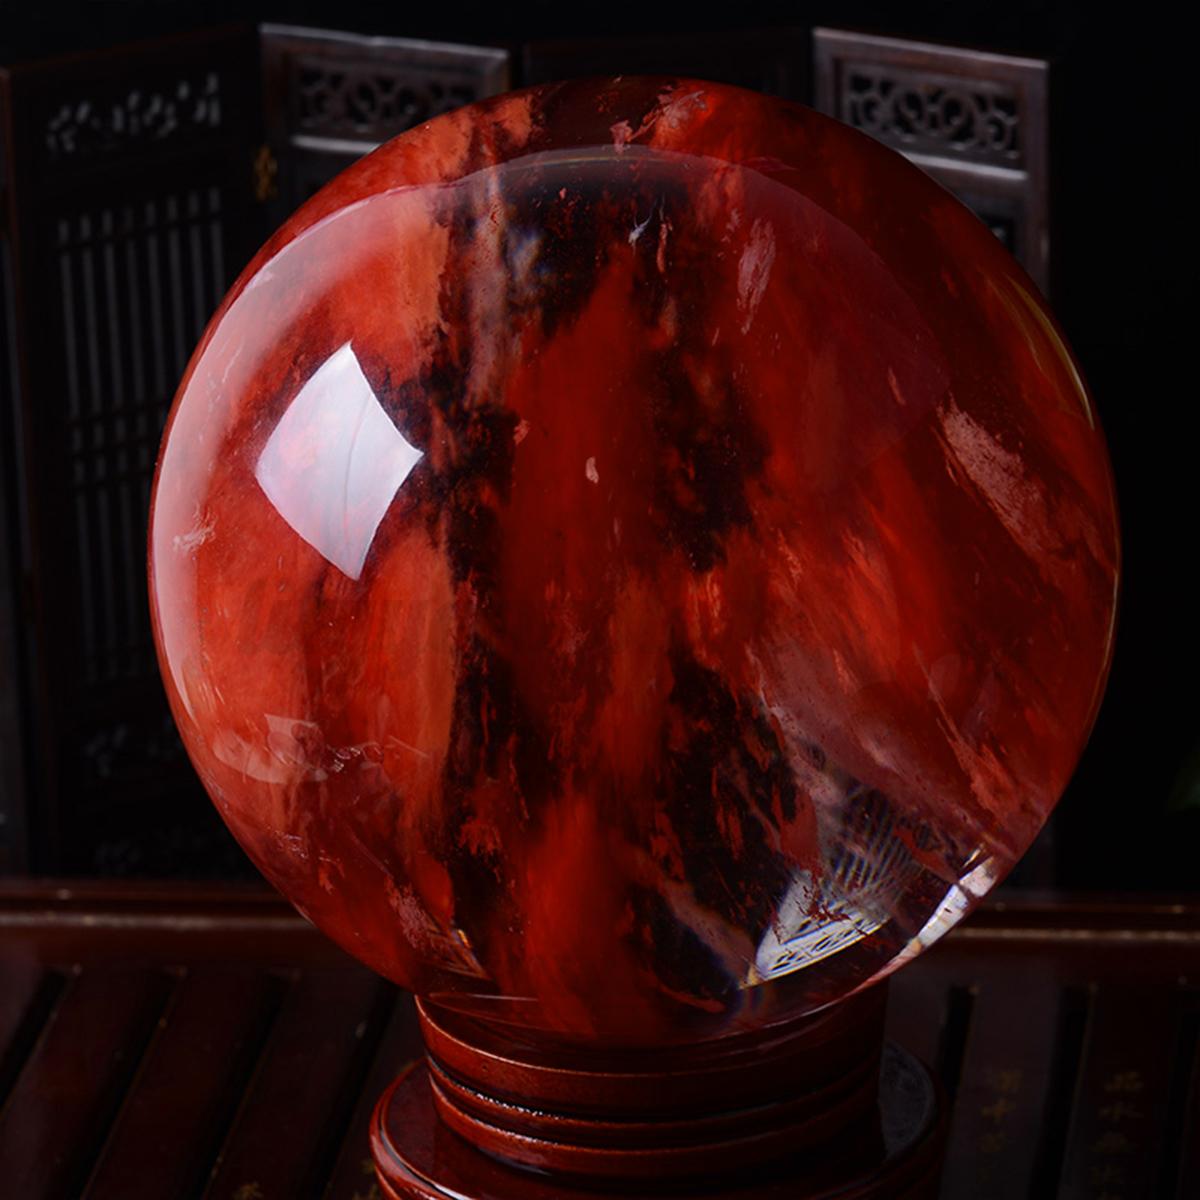 100mm Red Melting Quartz Crystal Sphere Ball Healing Home Decorators Catalog Best Ideas of Home Decor and Design [homedecoratorscatalog.us]